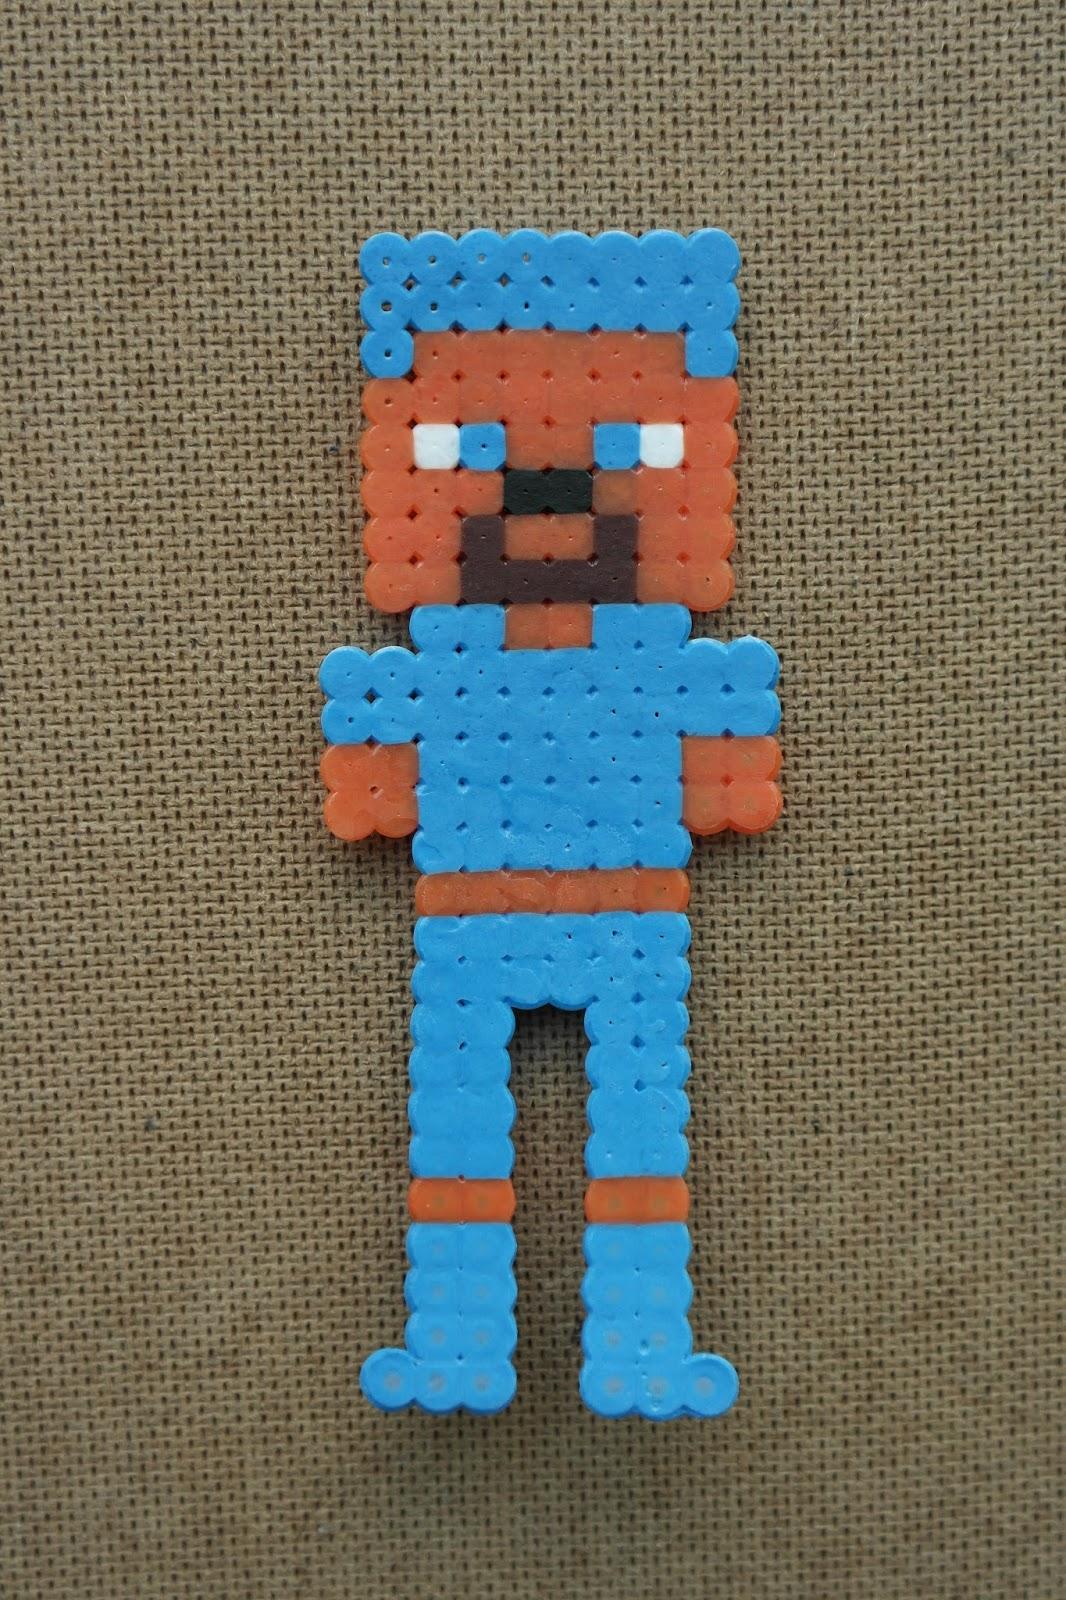 Pyssla Ideas Minecraft Character 01